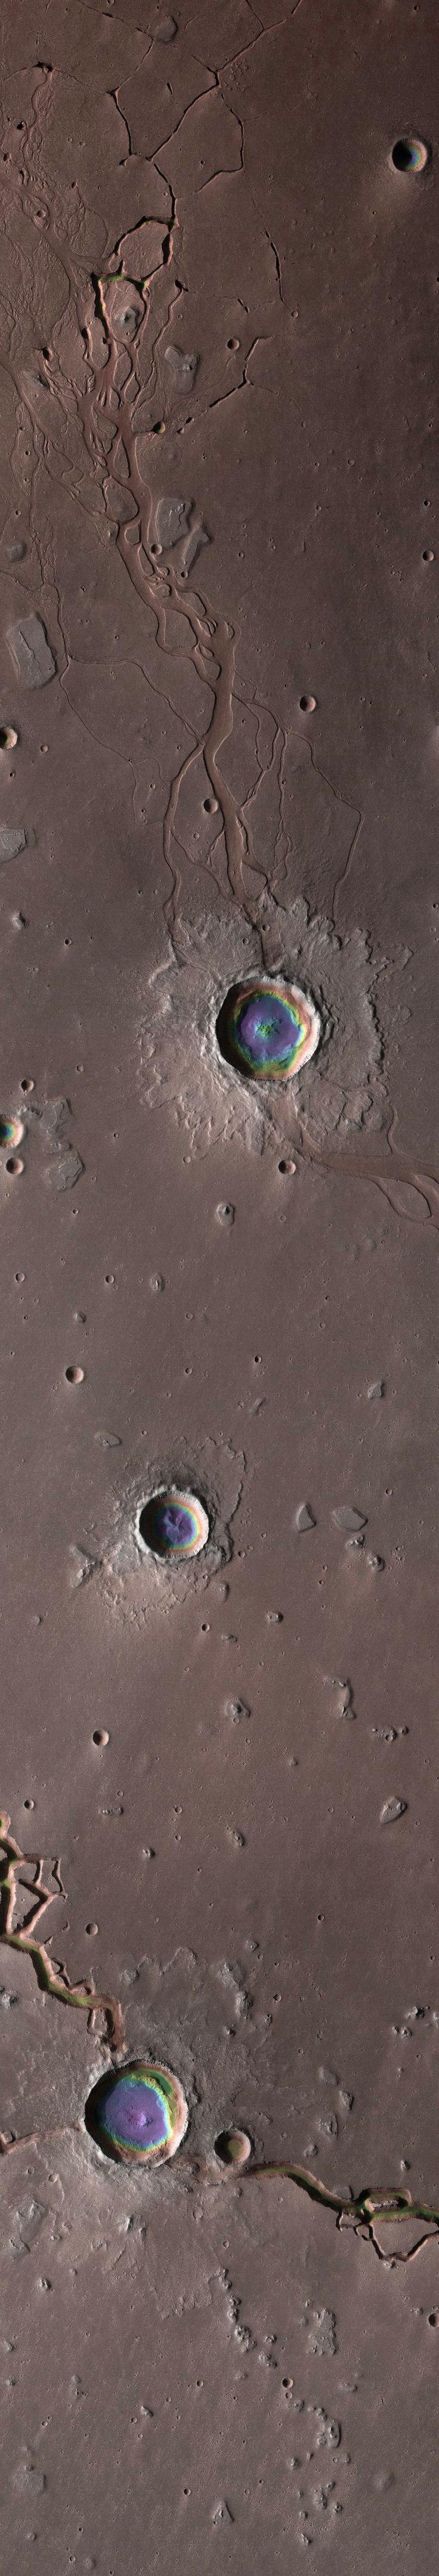 The Depths of Hephaestus Fossae, Mars